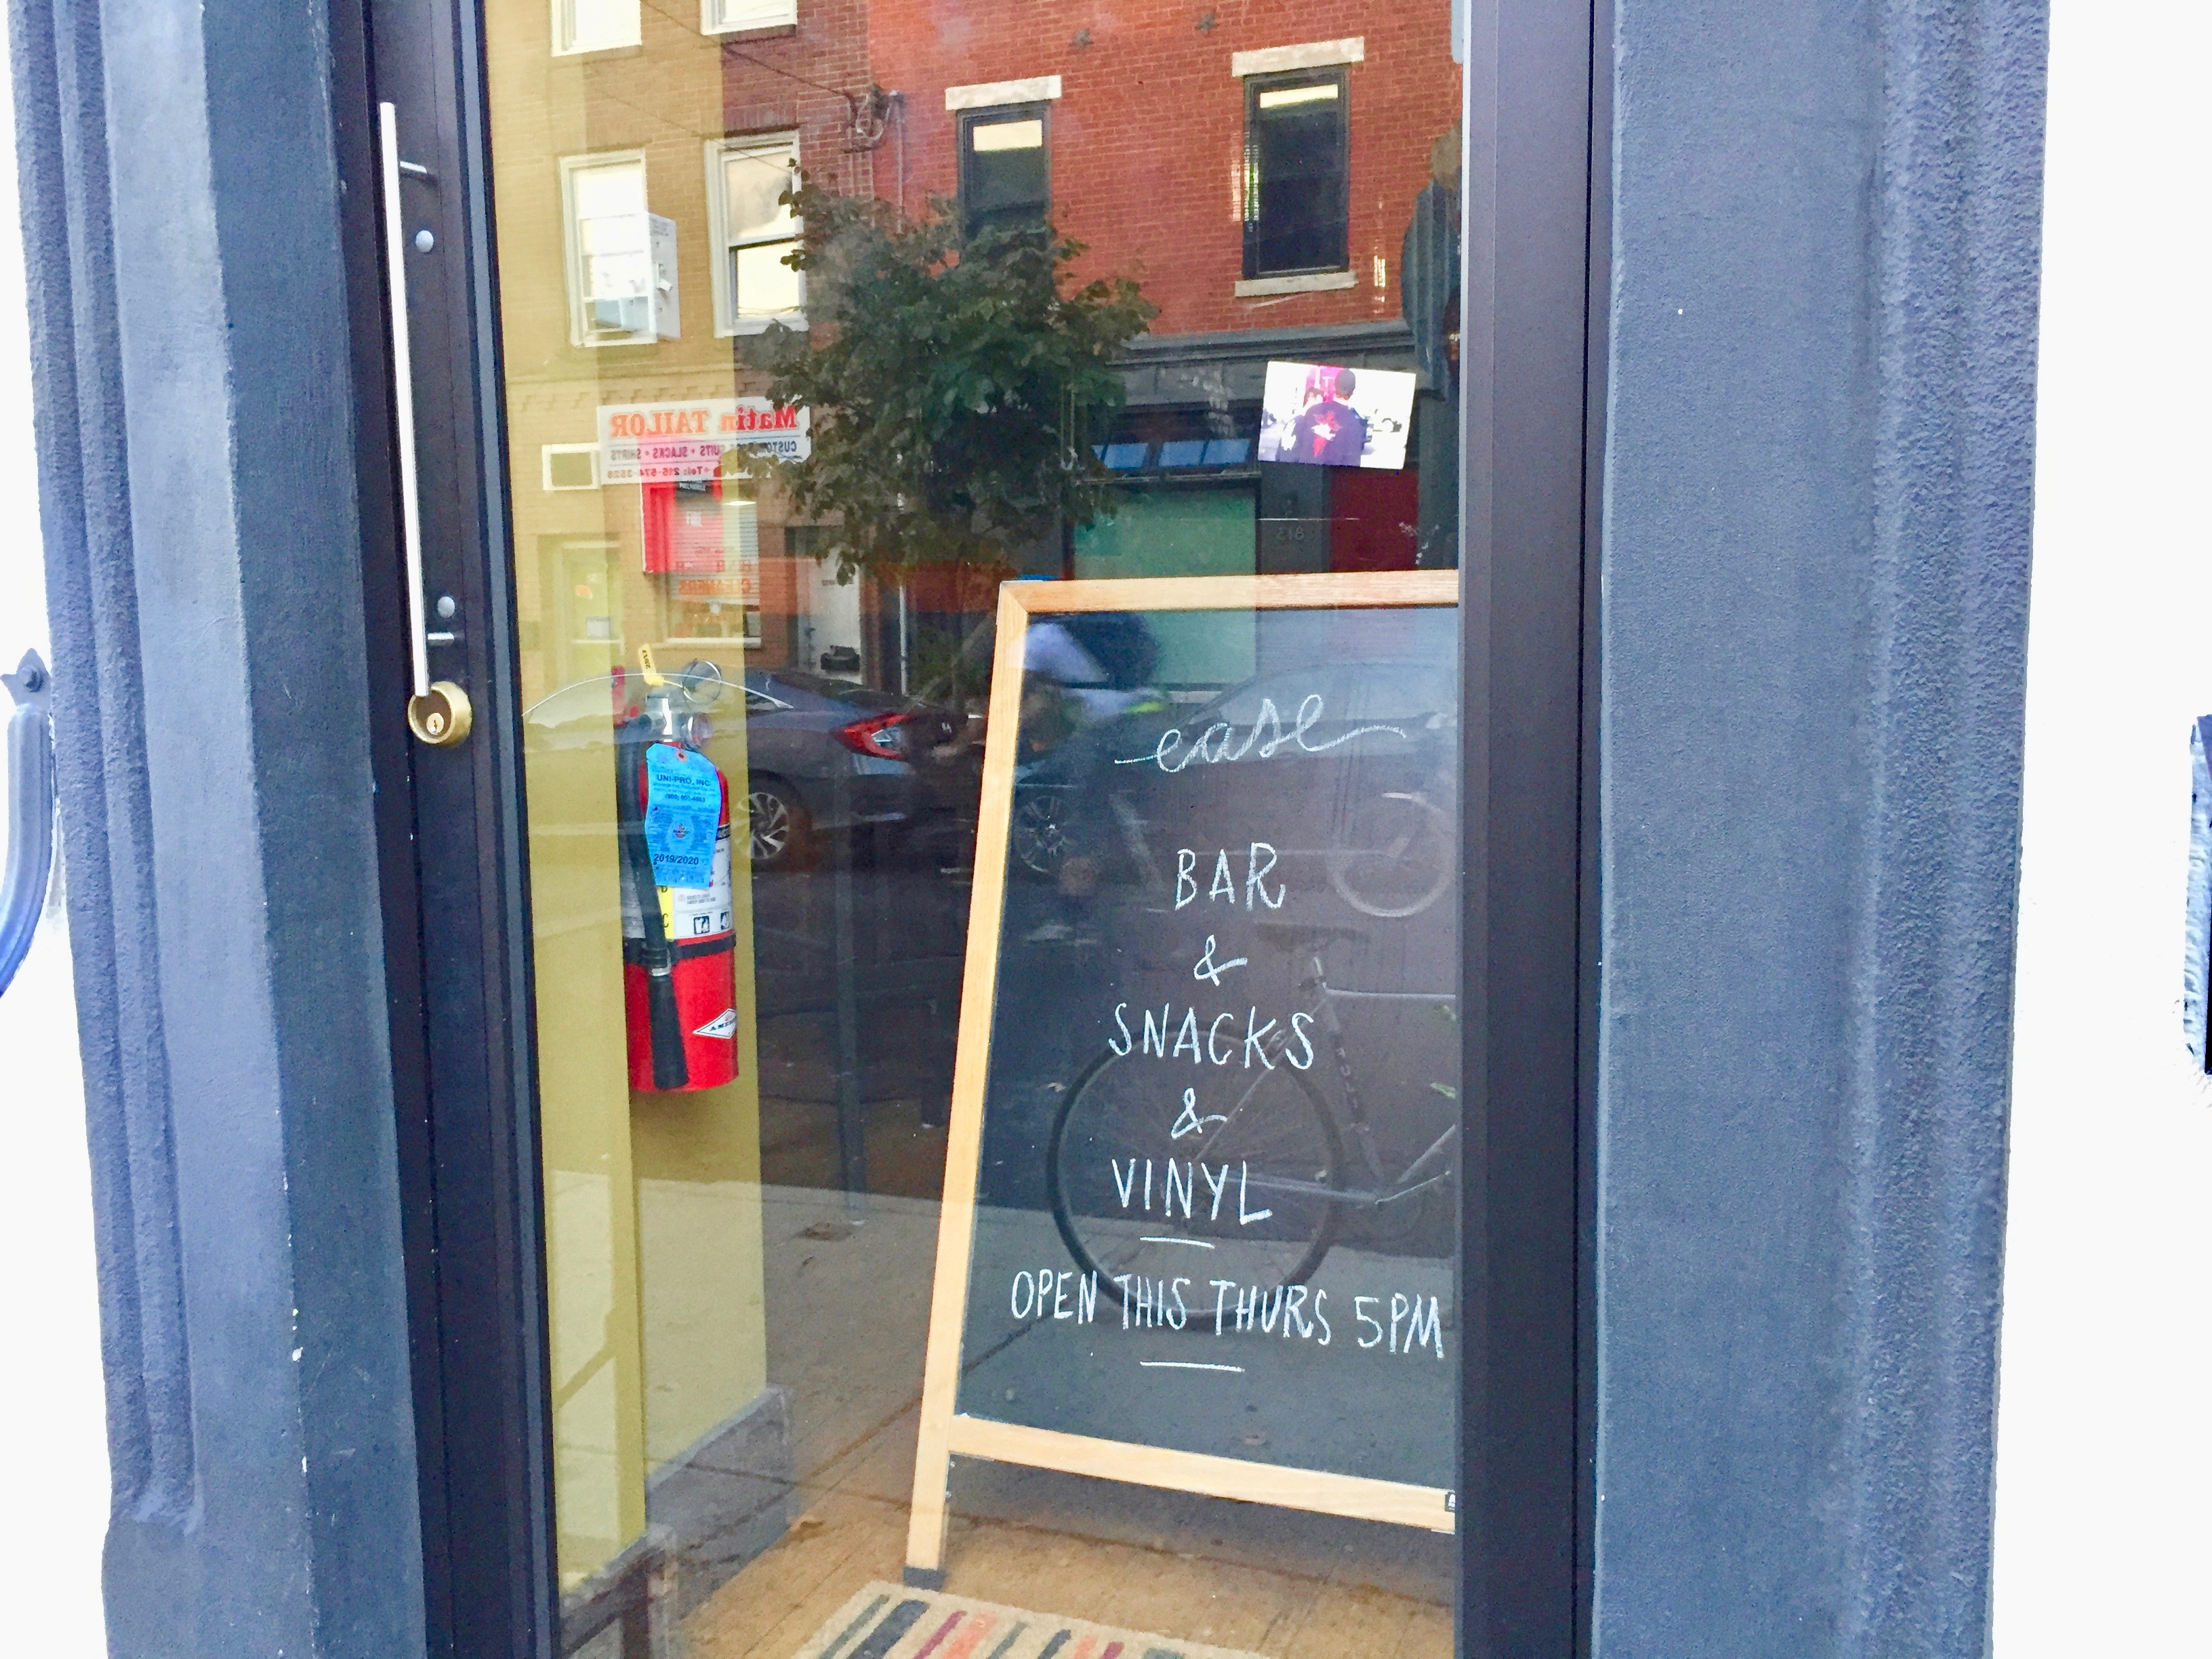 door of bar with sign that says bar, snacks, vinyl